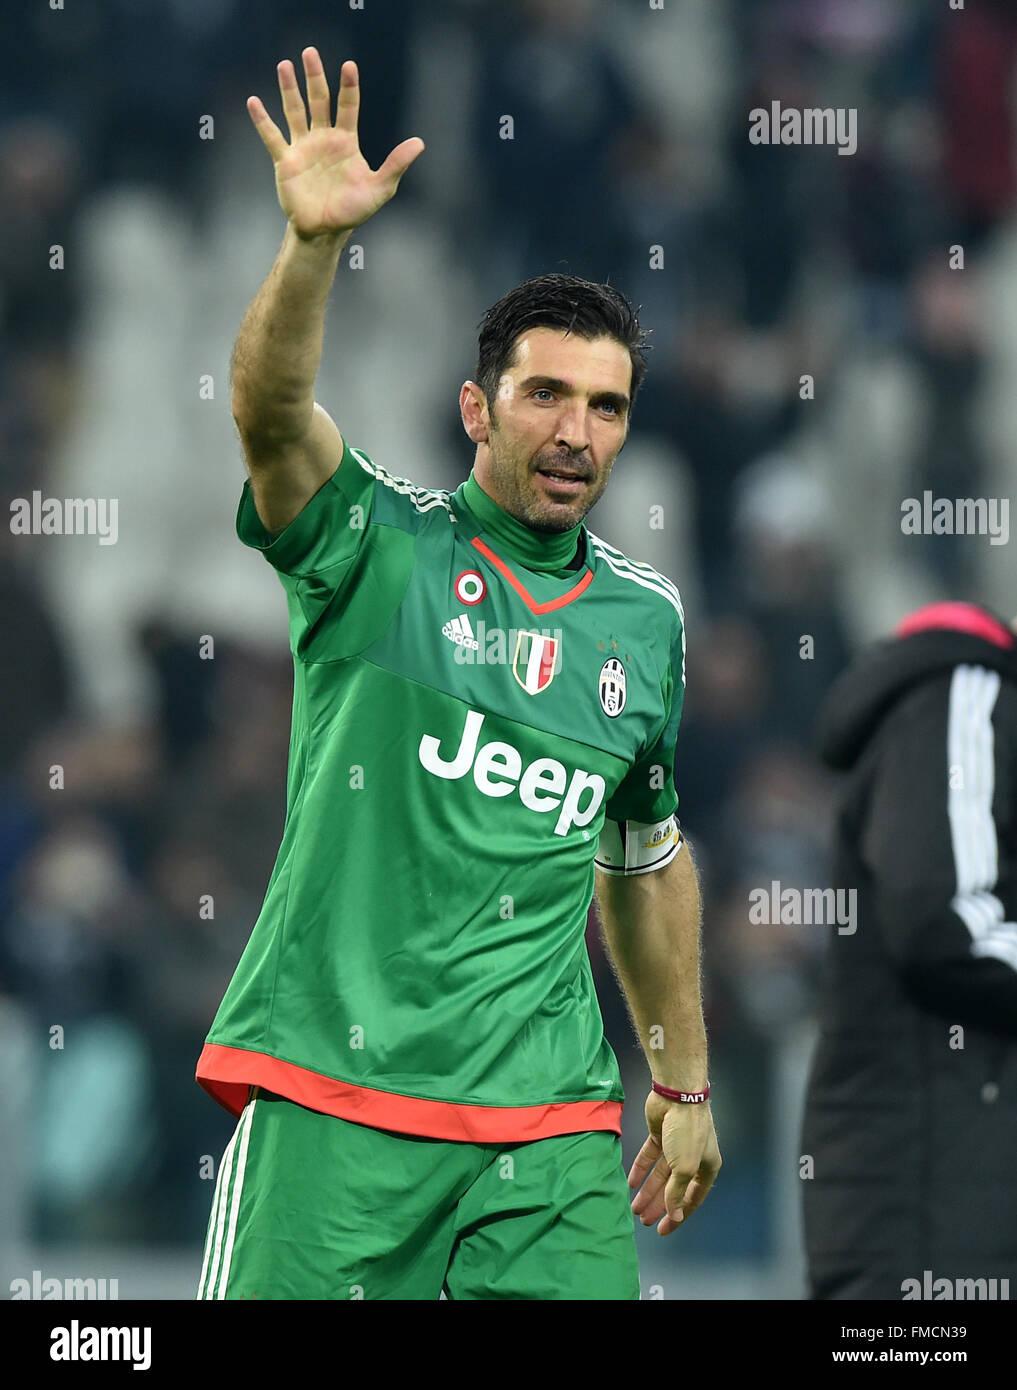 Turin Italy 11th Mar 2016 Goalie Gianluigi Buffon Of Juventus Stock Photo Alamy